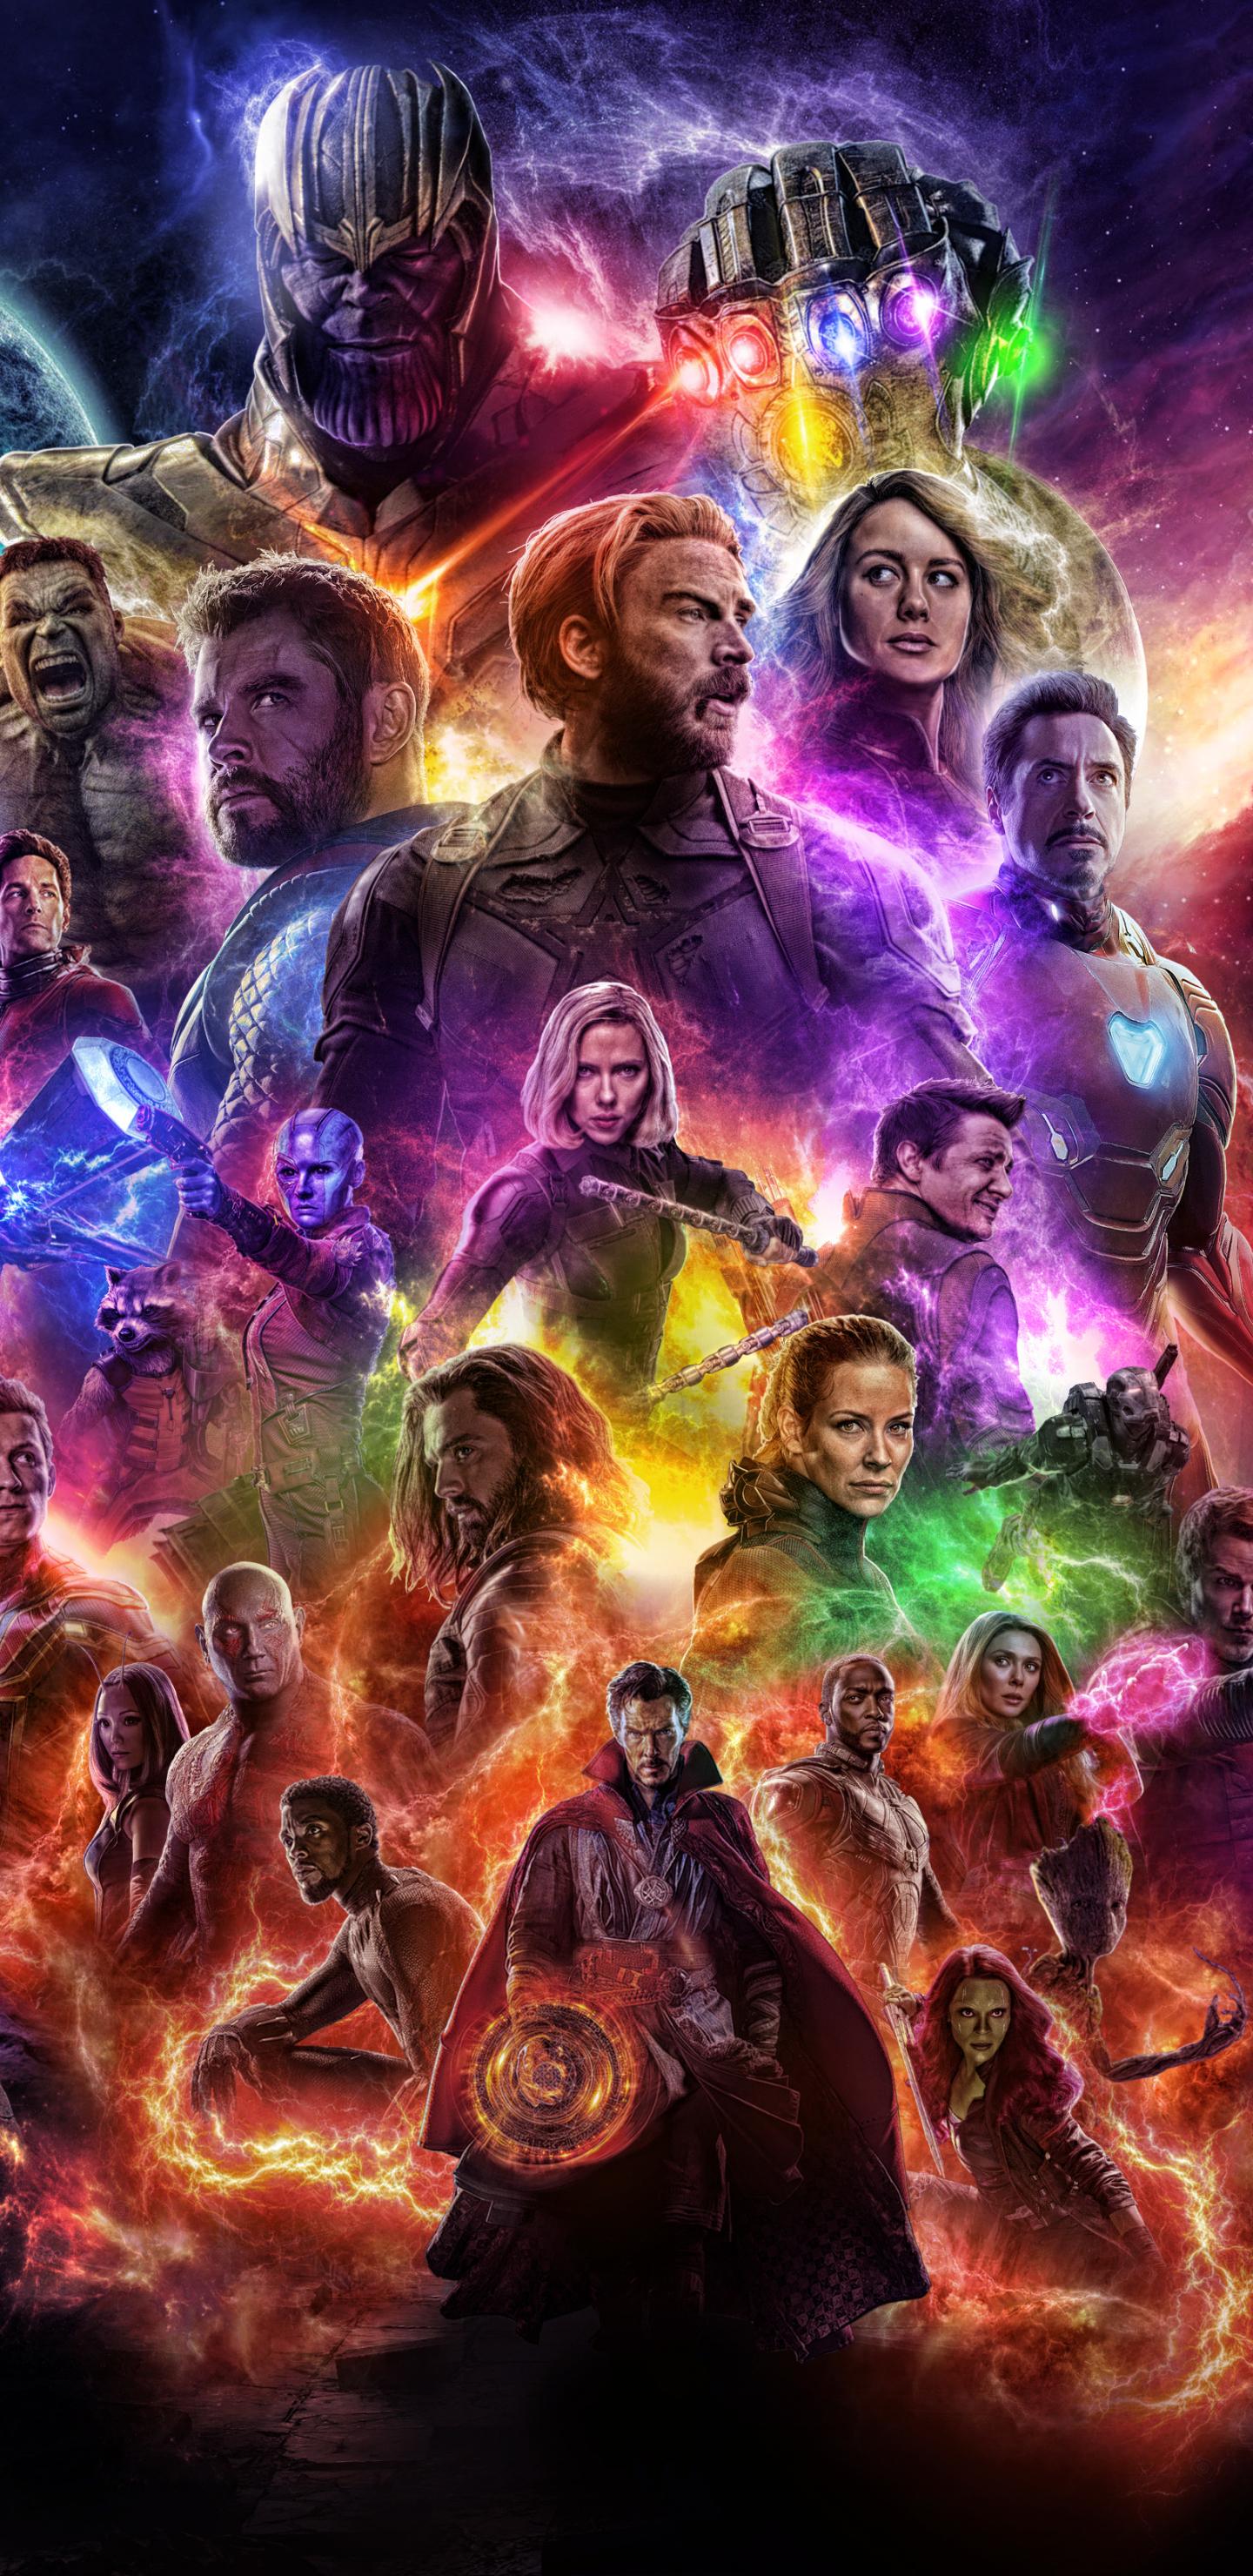 1440x2960 Avengers 4 Endgame 2019 Movie Keyart Samsung ...